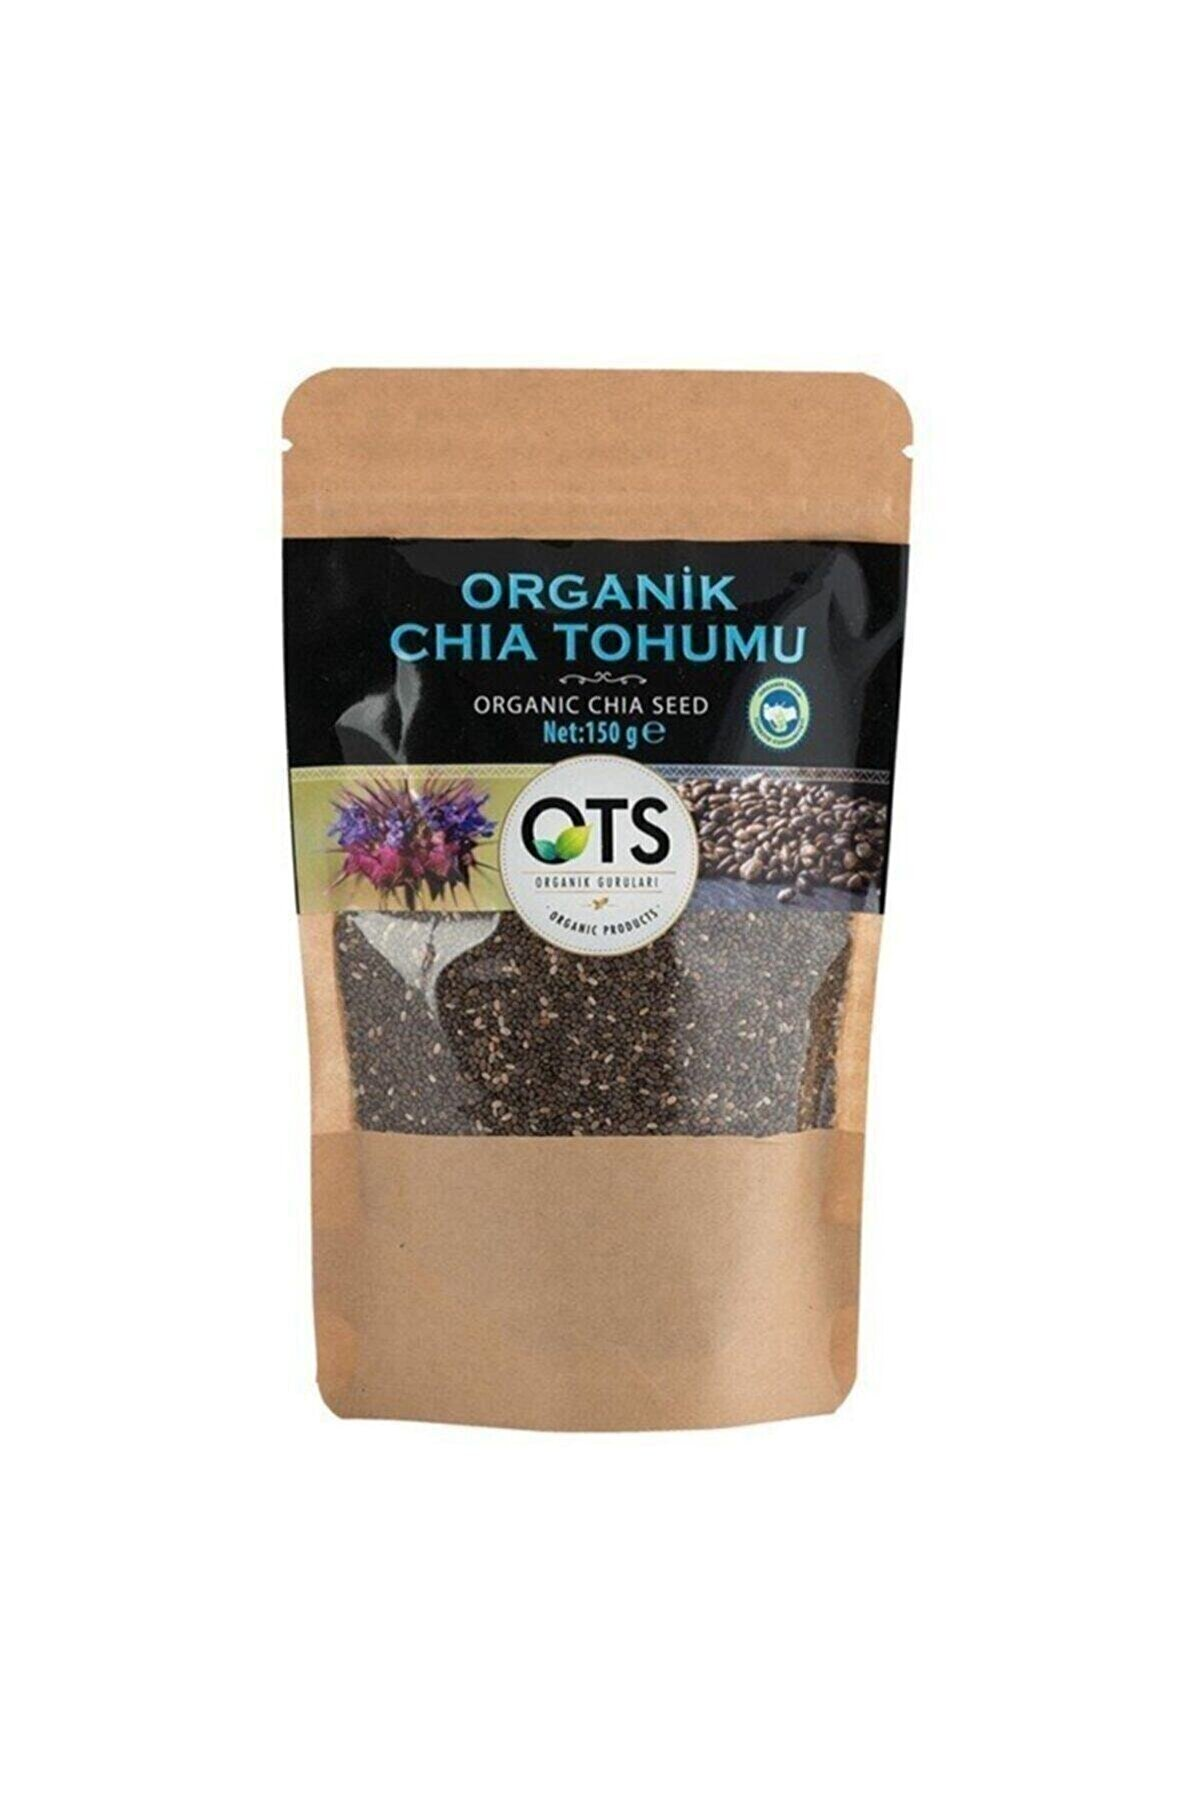 OTS Organik Organik Chia Tohumu